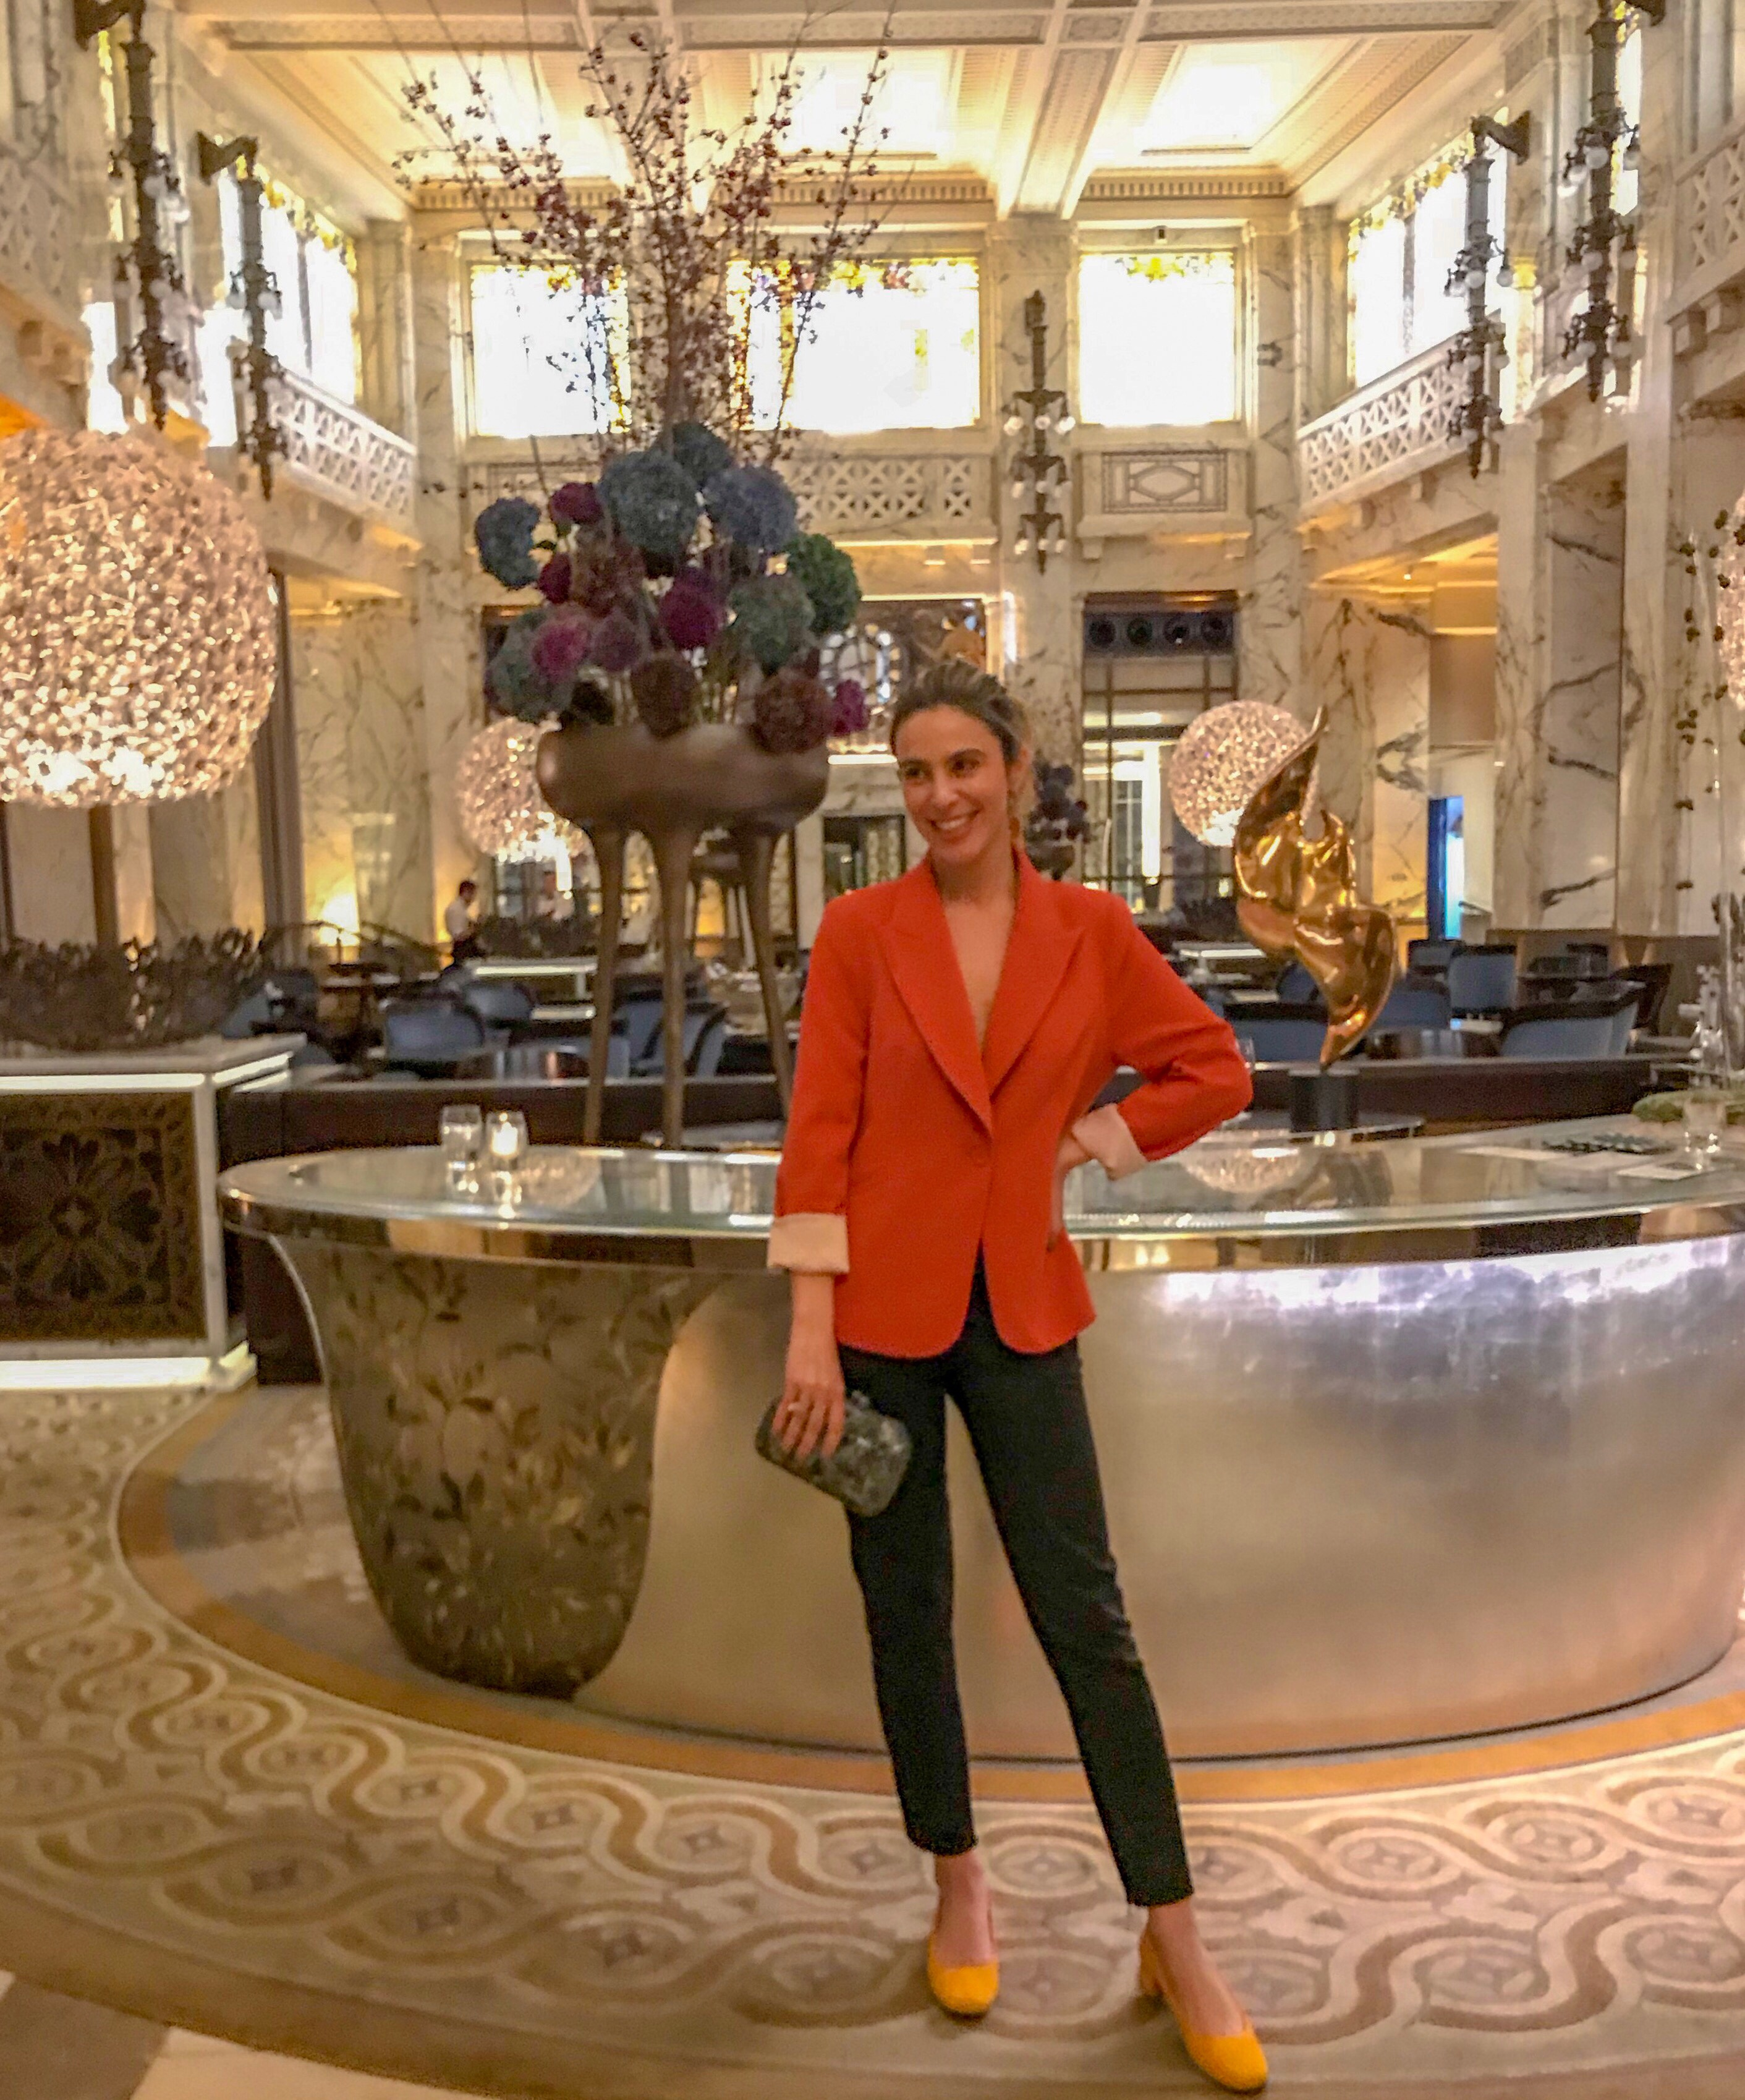 Park Hyatt Viena - O Império da Beleza